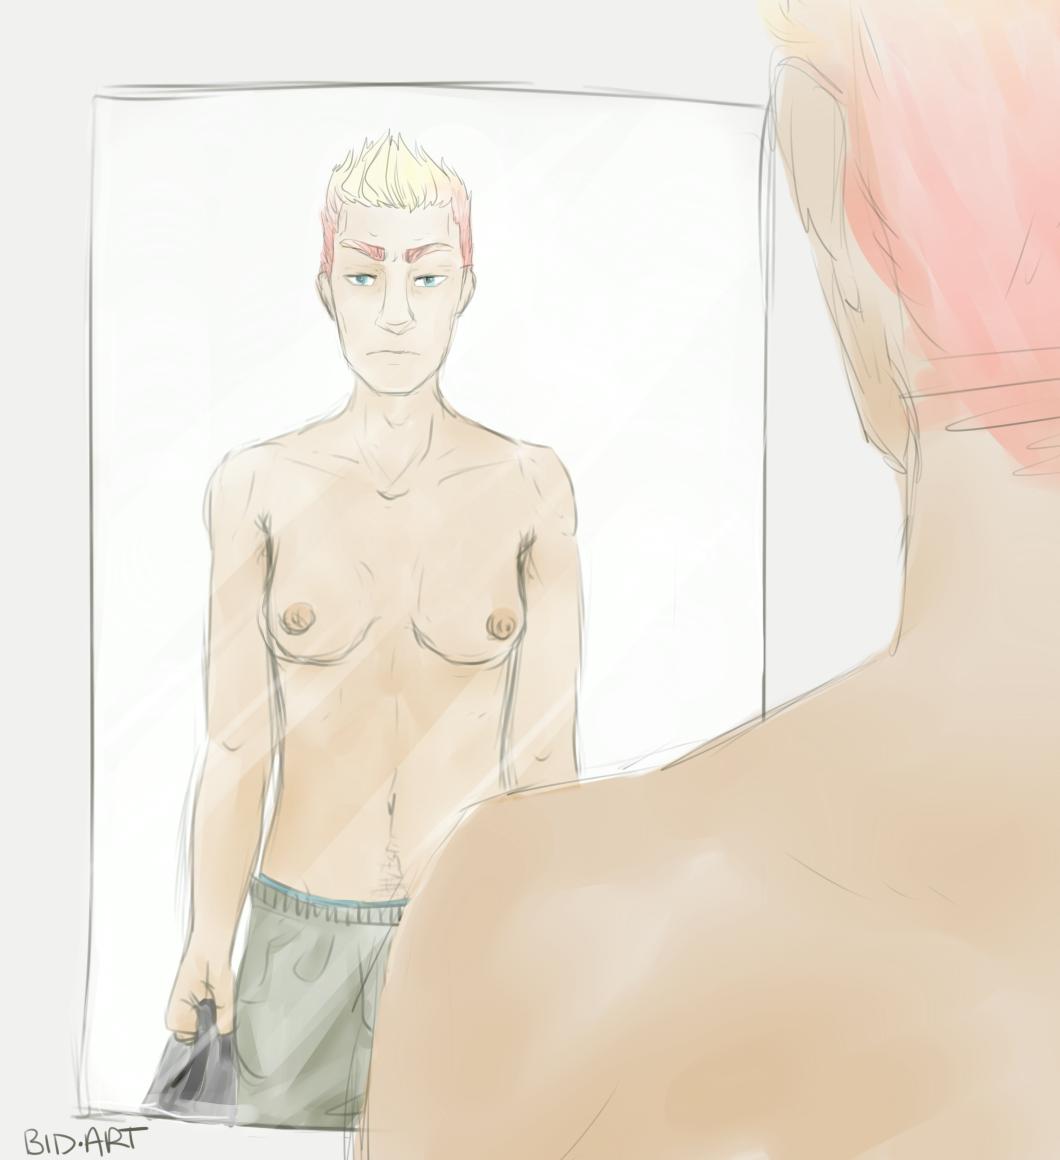 The Body. The Mirror. The Fiend.